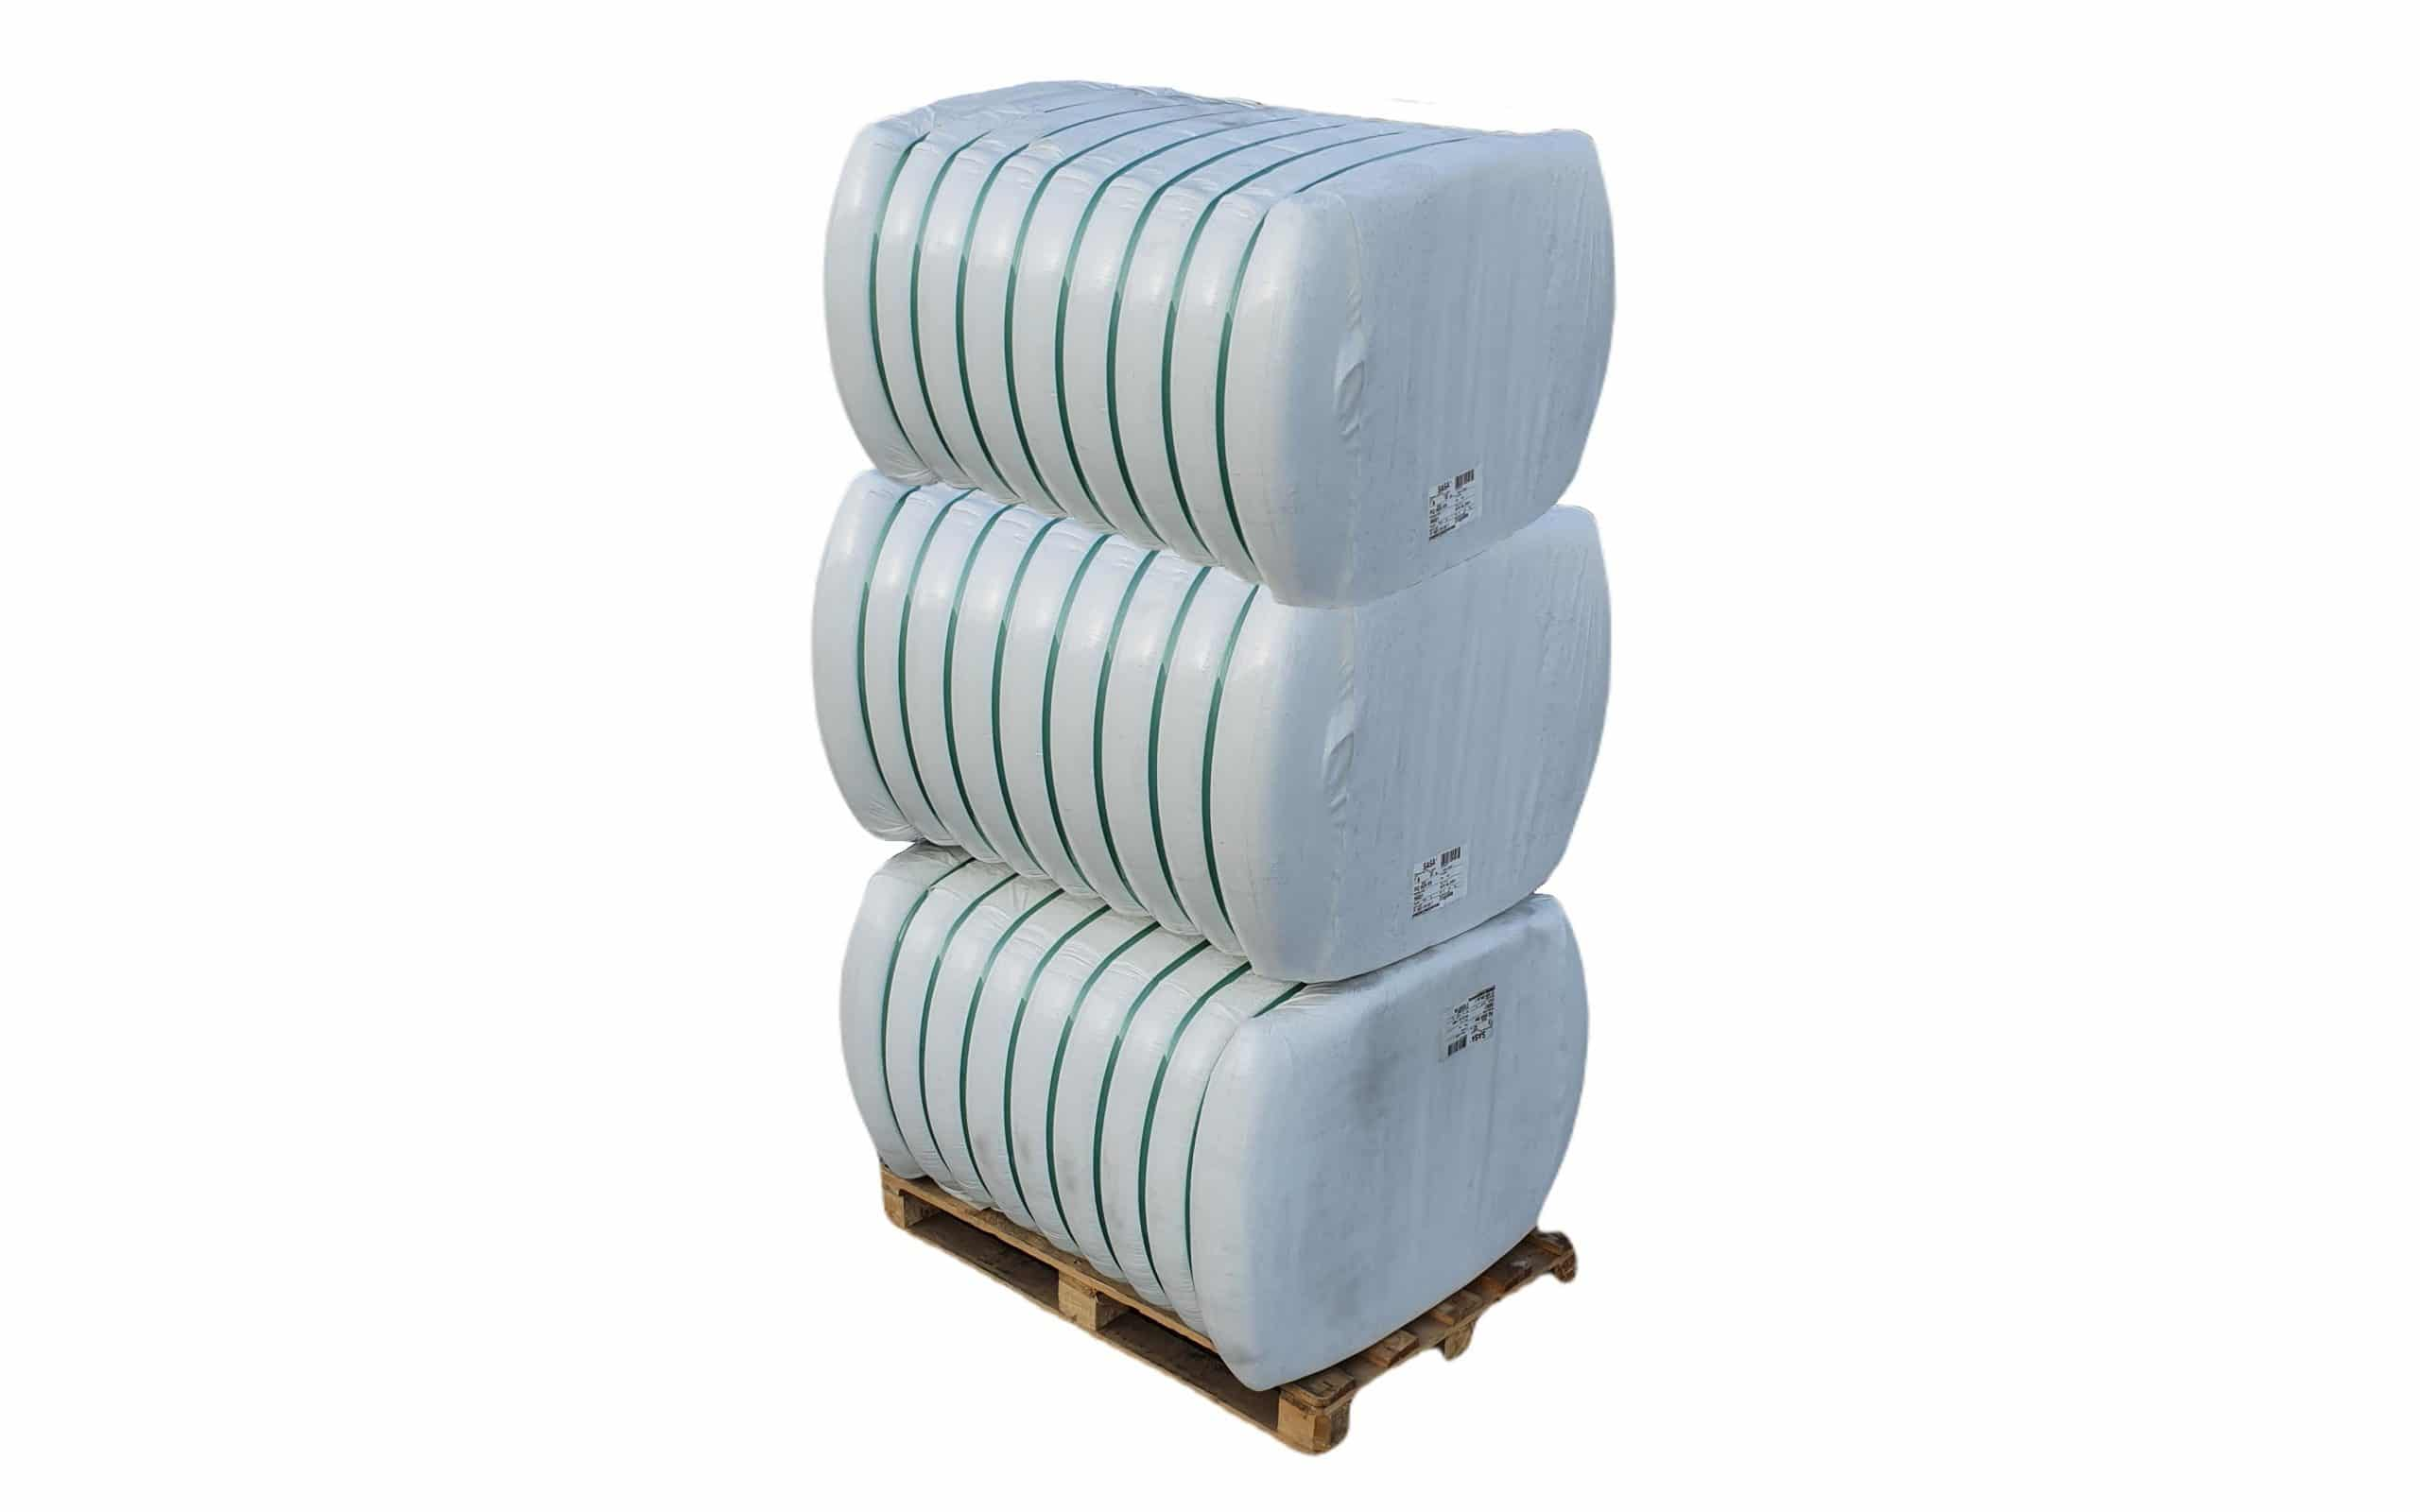 Fibra poliester hollow siliconizata conjugata, HCS 7D x 32 mm pentru fabricare umplutura perne si pilote, 3 x 250 Kg imagine 2021 somnart.ro